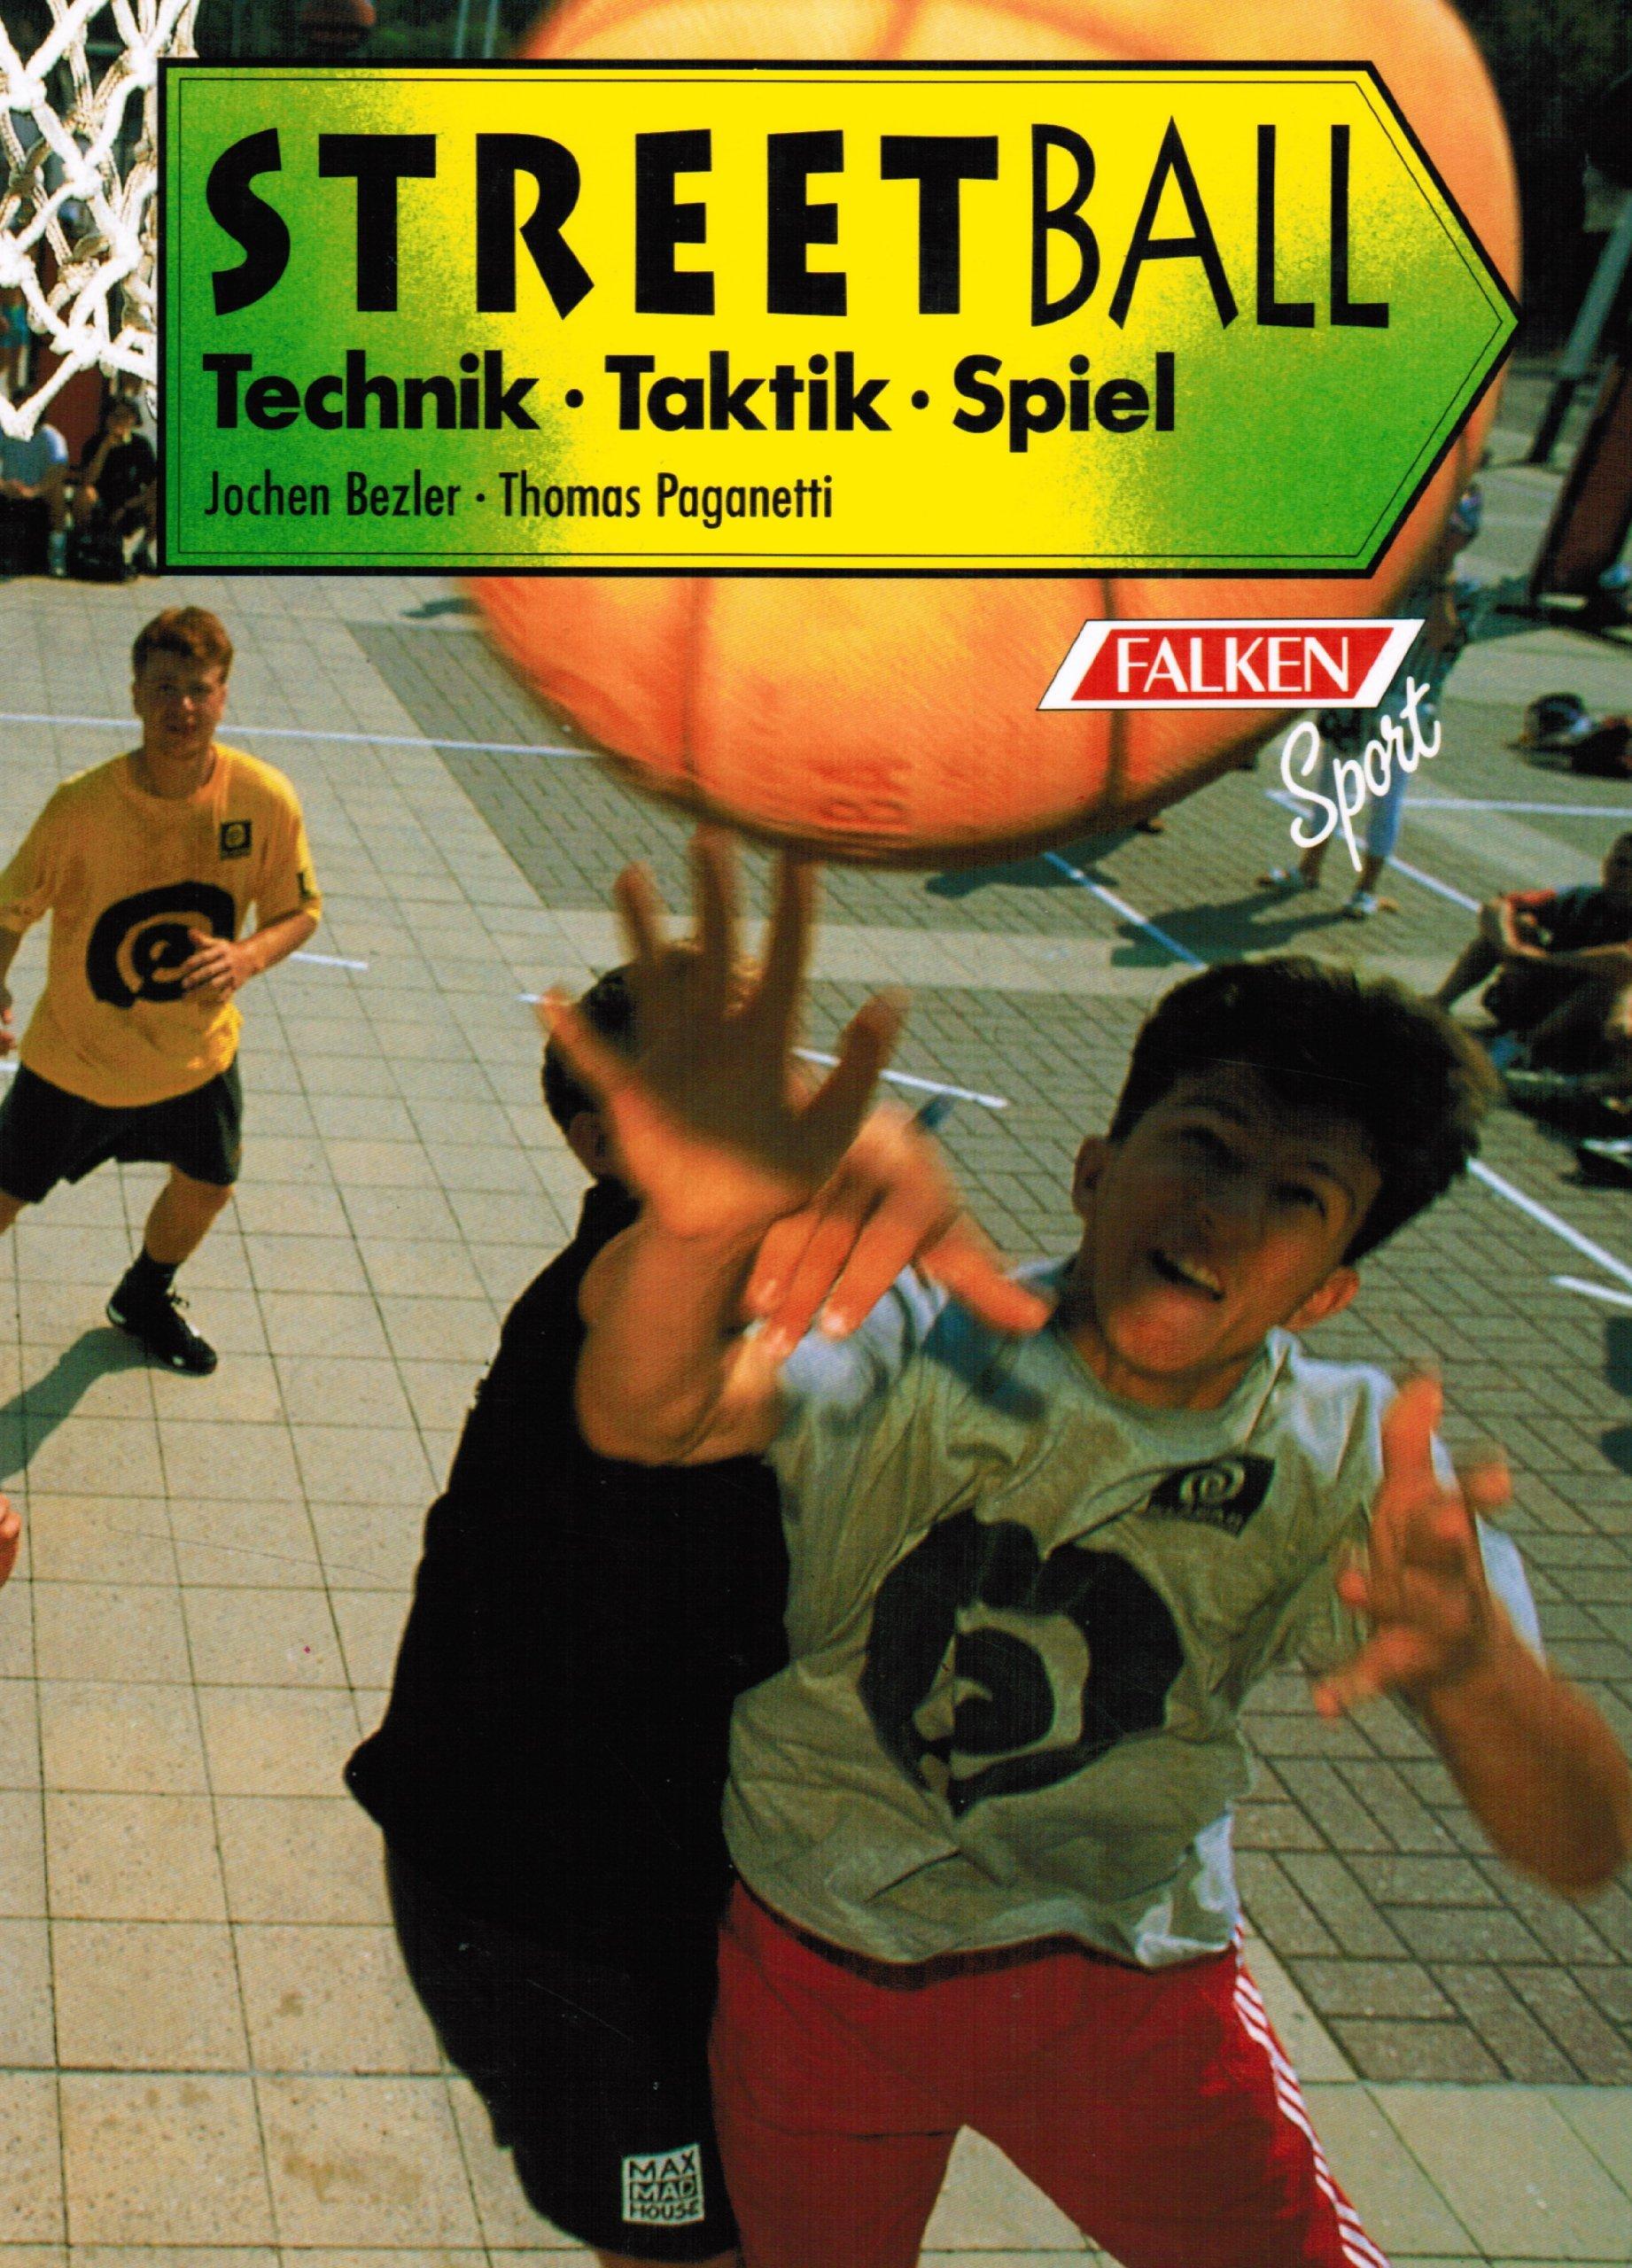 Streetball. Technik. Taktik. Spiel. Broschiert – März 2000 Jochen Bezler Thomas Paganetti Falken-Vlg. Niedernh.